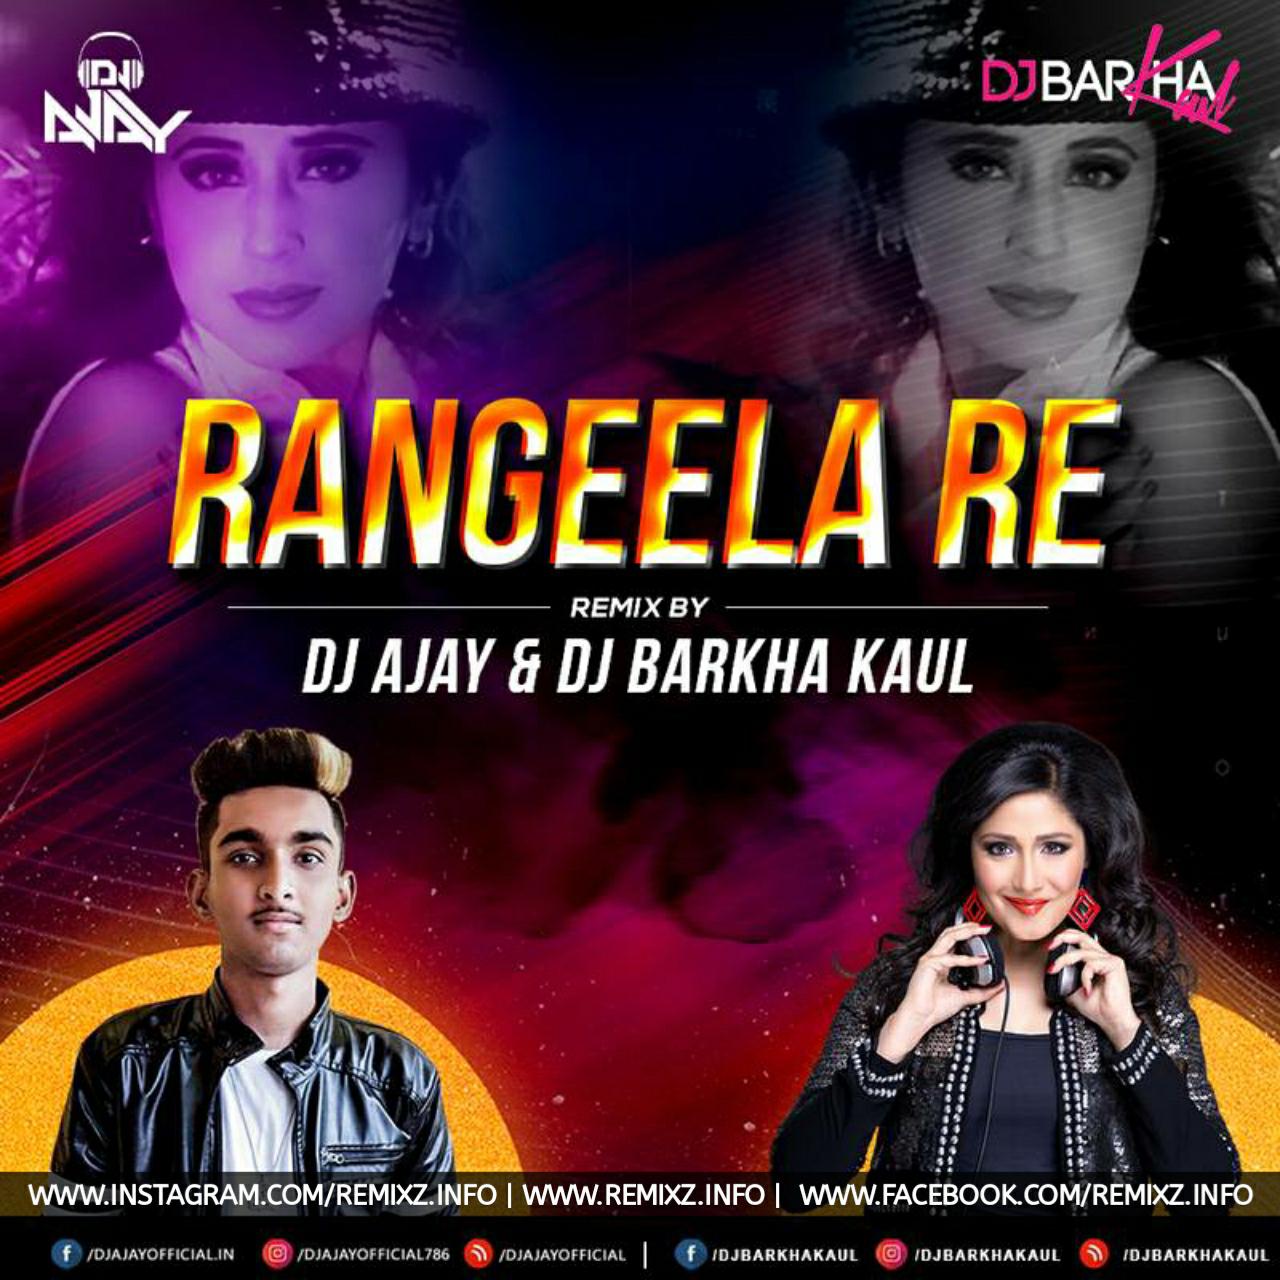 rangeela-re-remix-dj-ajay-x-dj-barkha.jpg